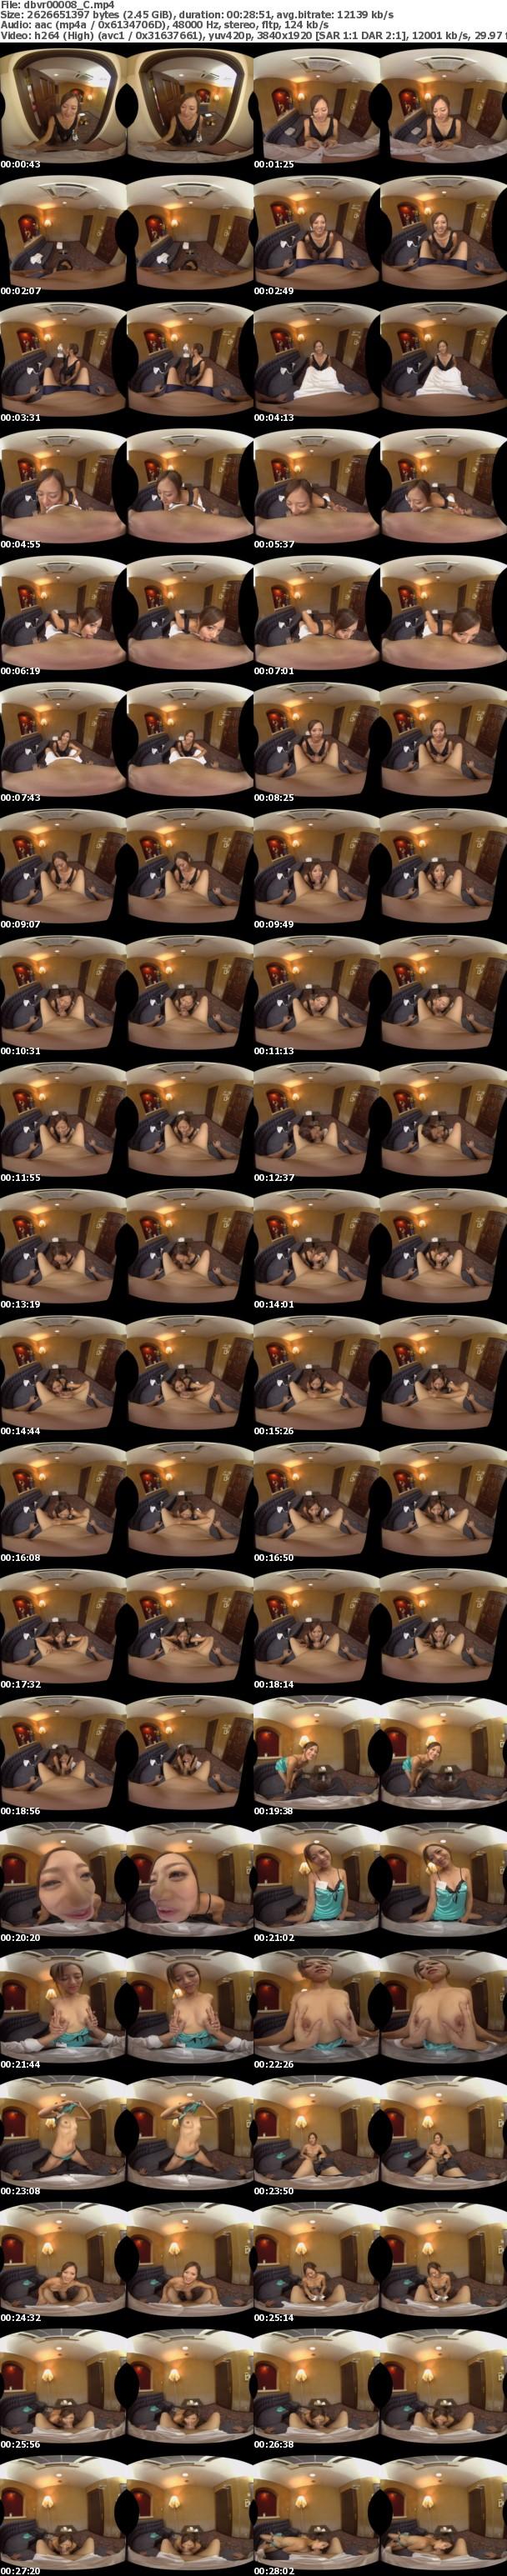 VR/3D DBVR-008 「ねぇ、いっぱい中に出して…」風俗に行ったら超カワイイ子がキタ━━━━(゚∀゚)━━━━!! 超密着風俗フルコースで中出しSEX 星川光希